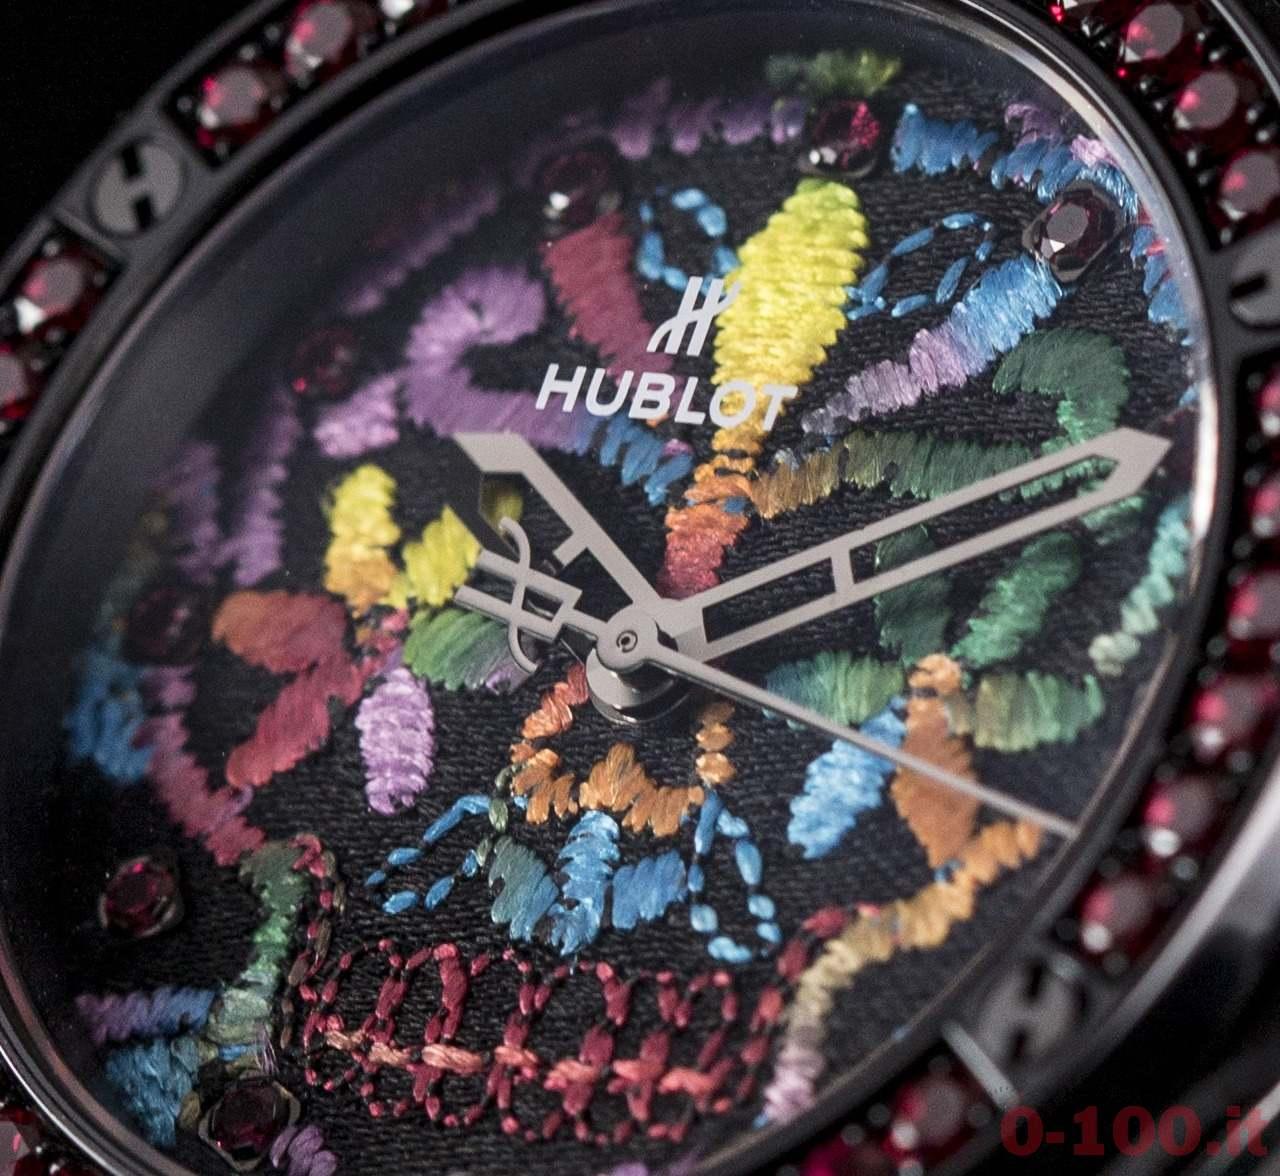 hublot-big-bang-broderie-sugar-skull-limited-edition-ref-343-cs-6599-nr-1213_0-1003